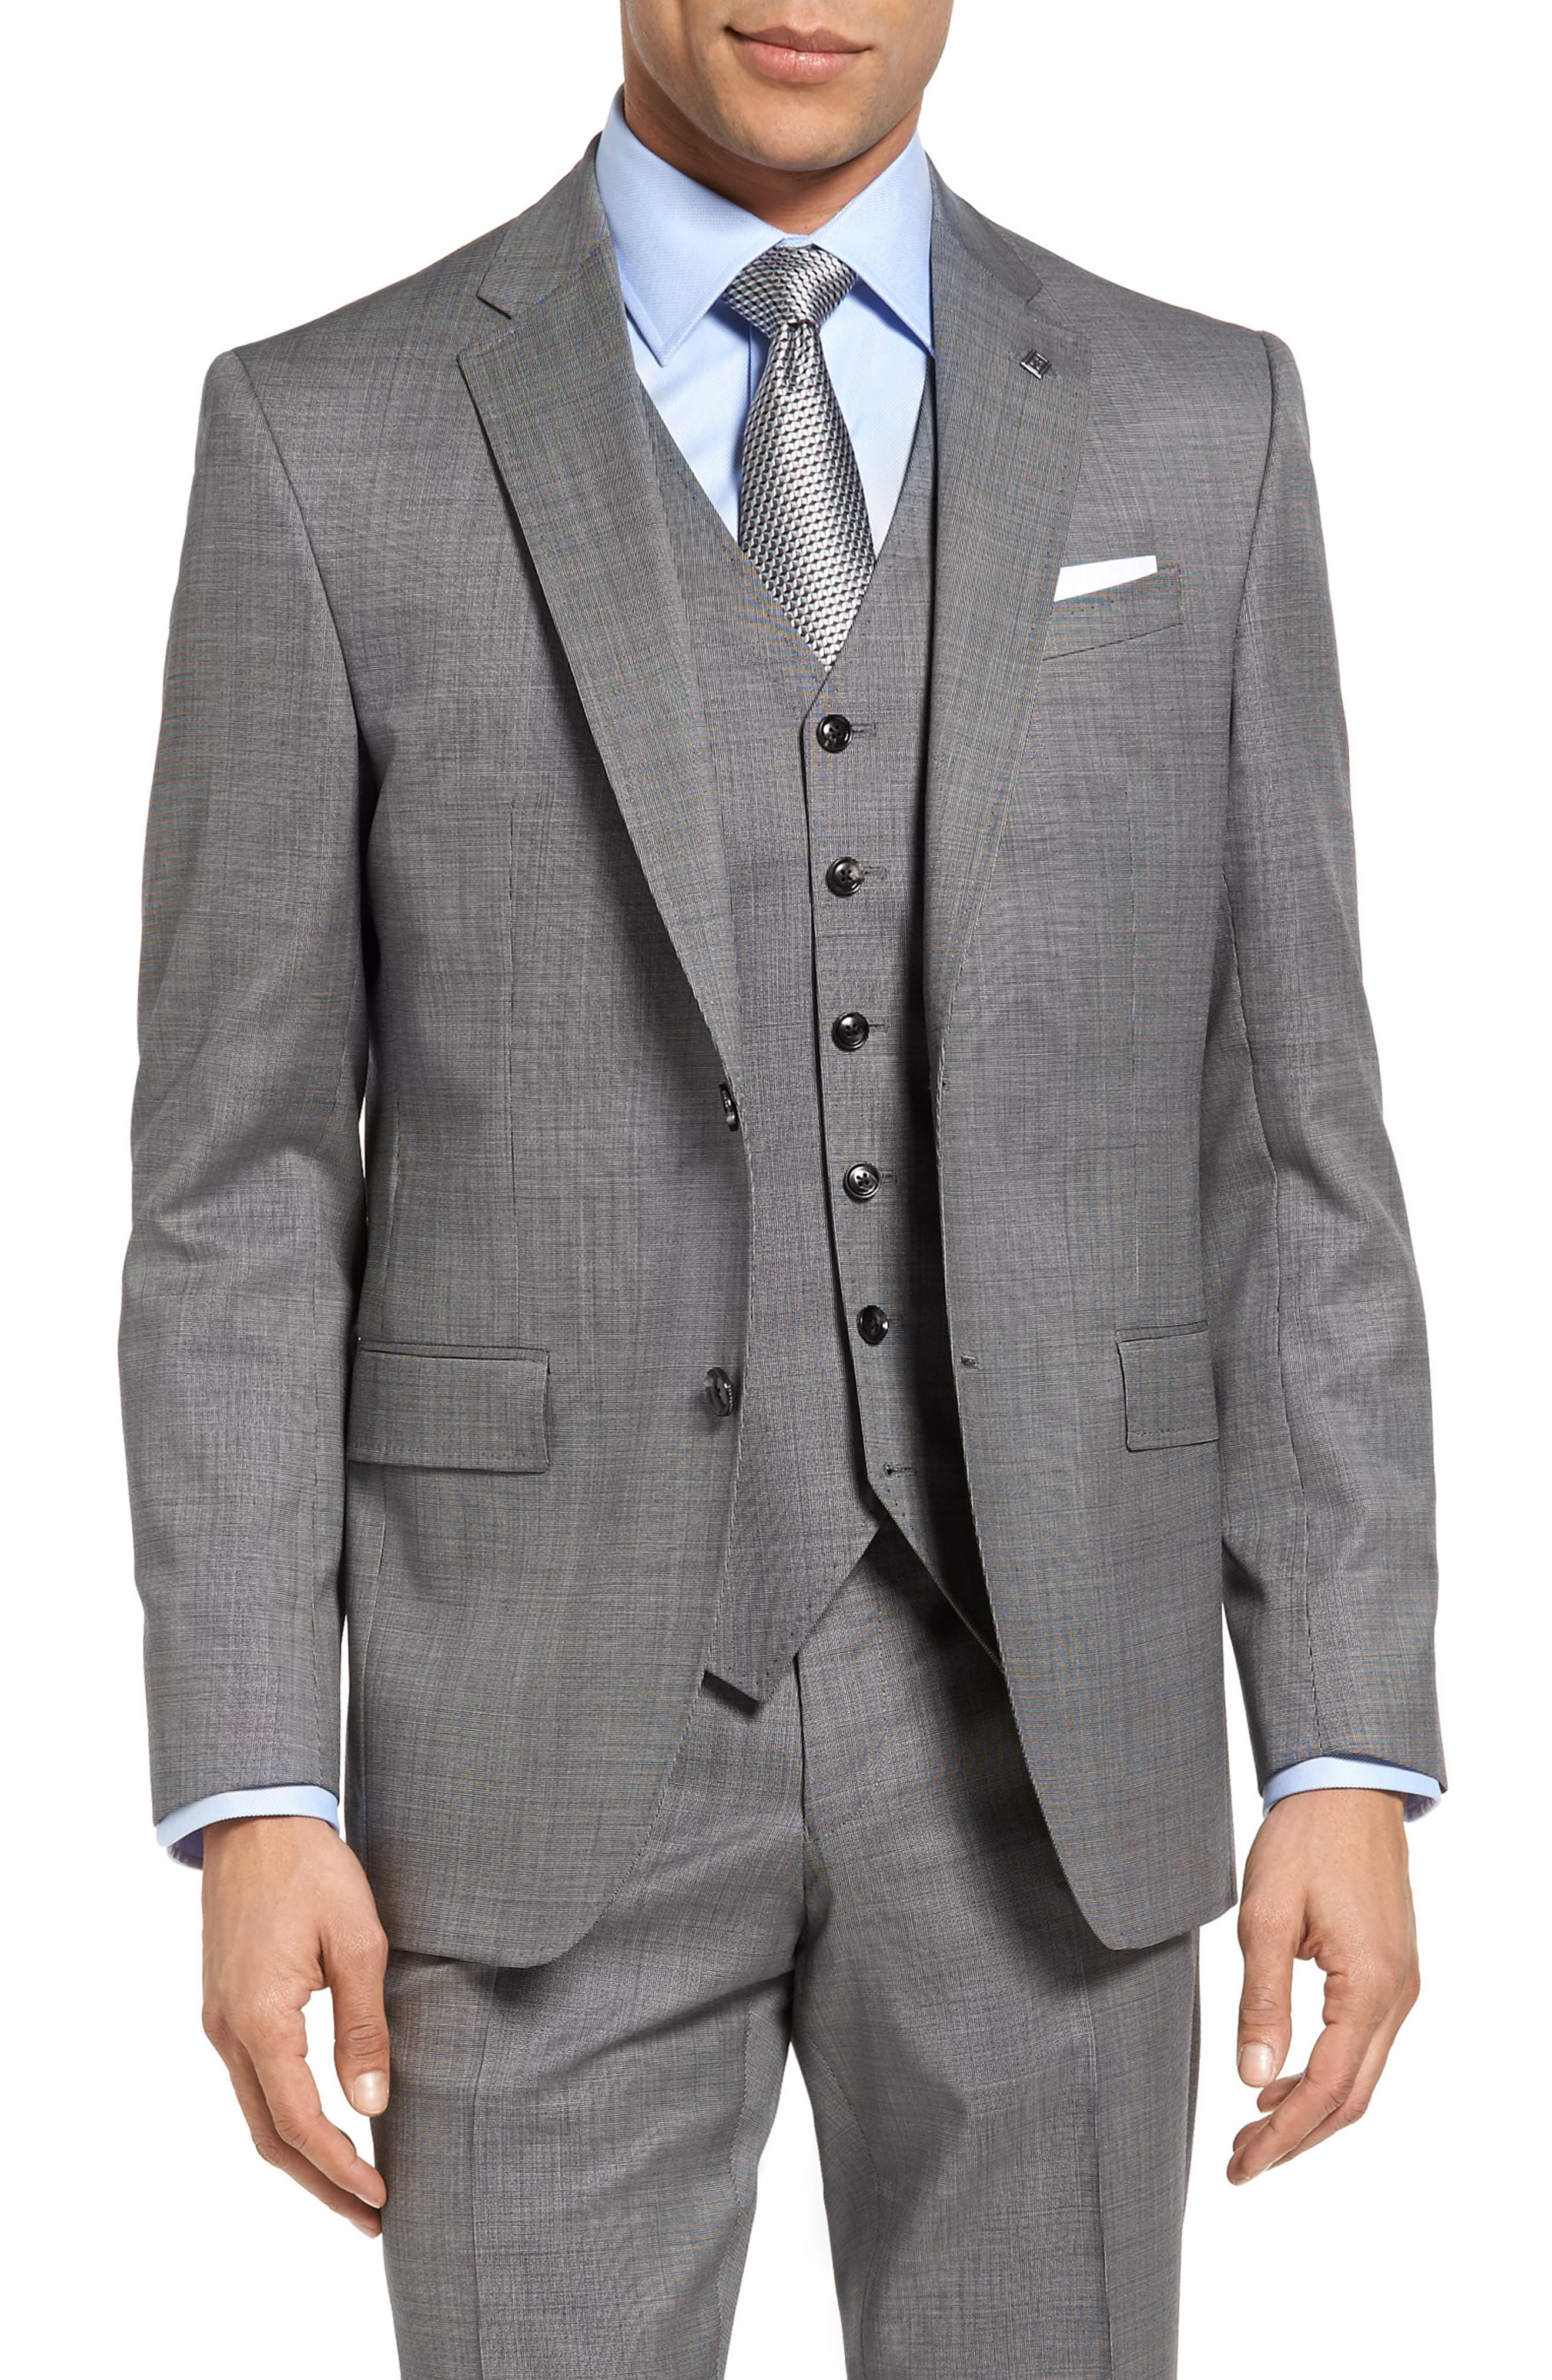 Jay Trim Fit Solid Wool Suit,                             Alternate thumbnail 10, color,                             LIGHT GREY